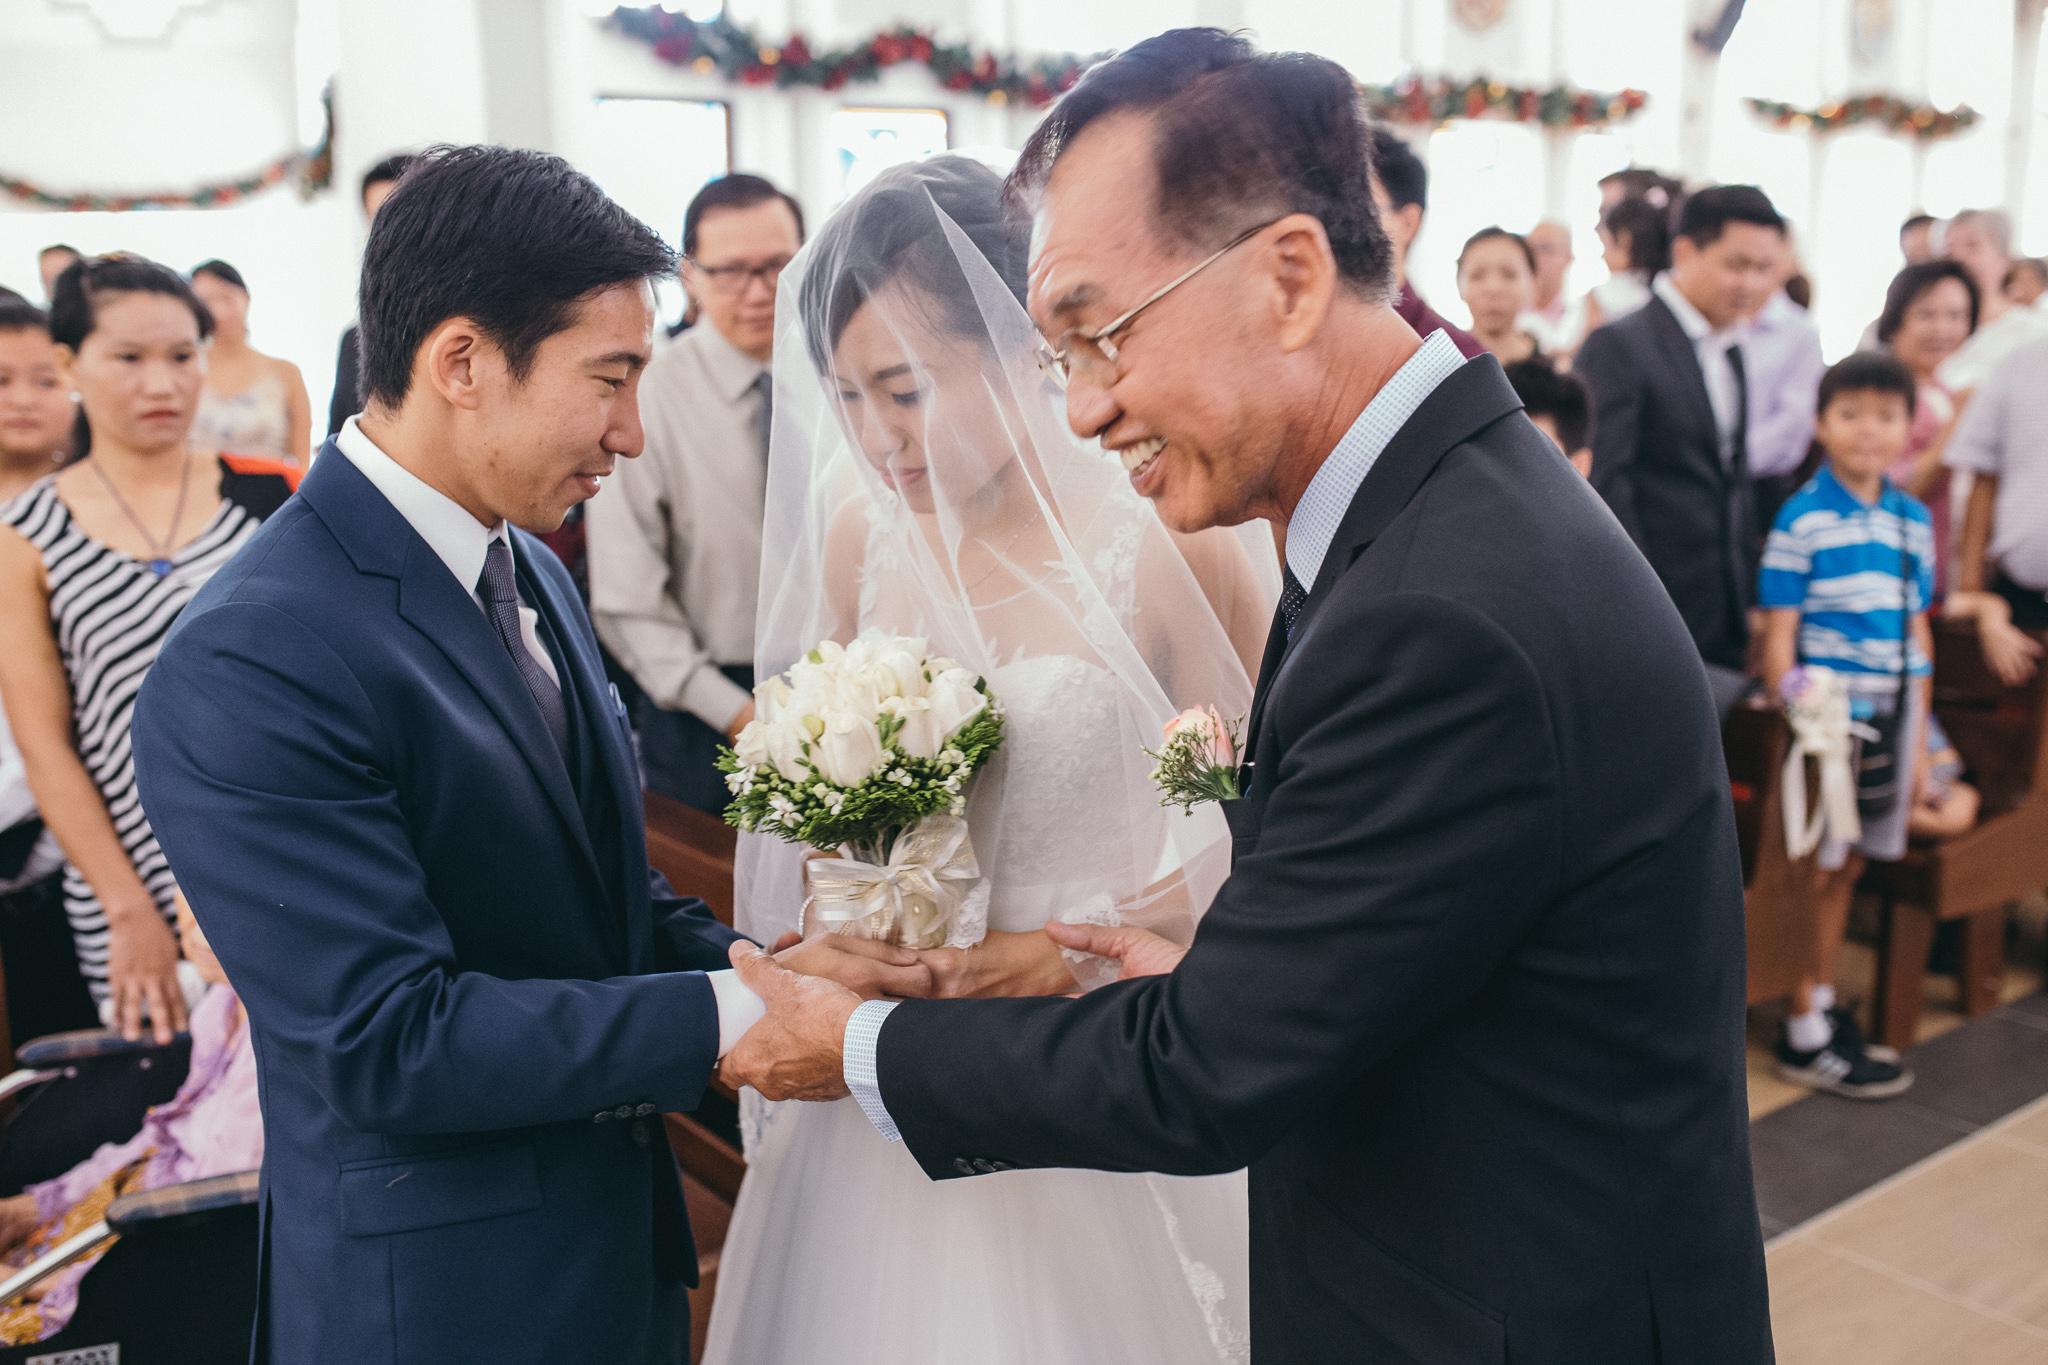 Juxtapose Pix - Wedding - Kelvin & Serene - church regent hotel 00026.jpg